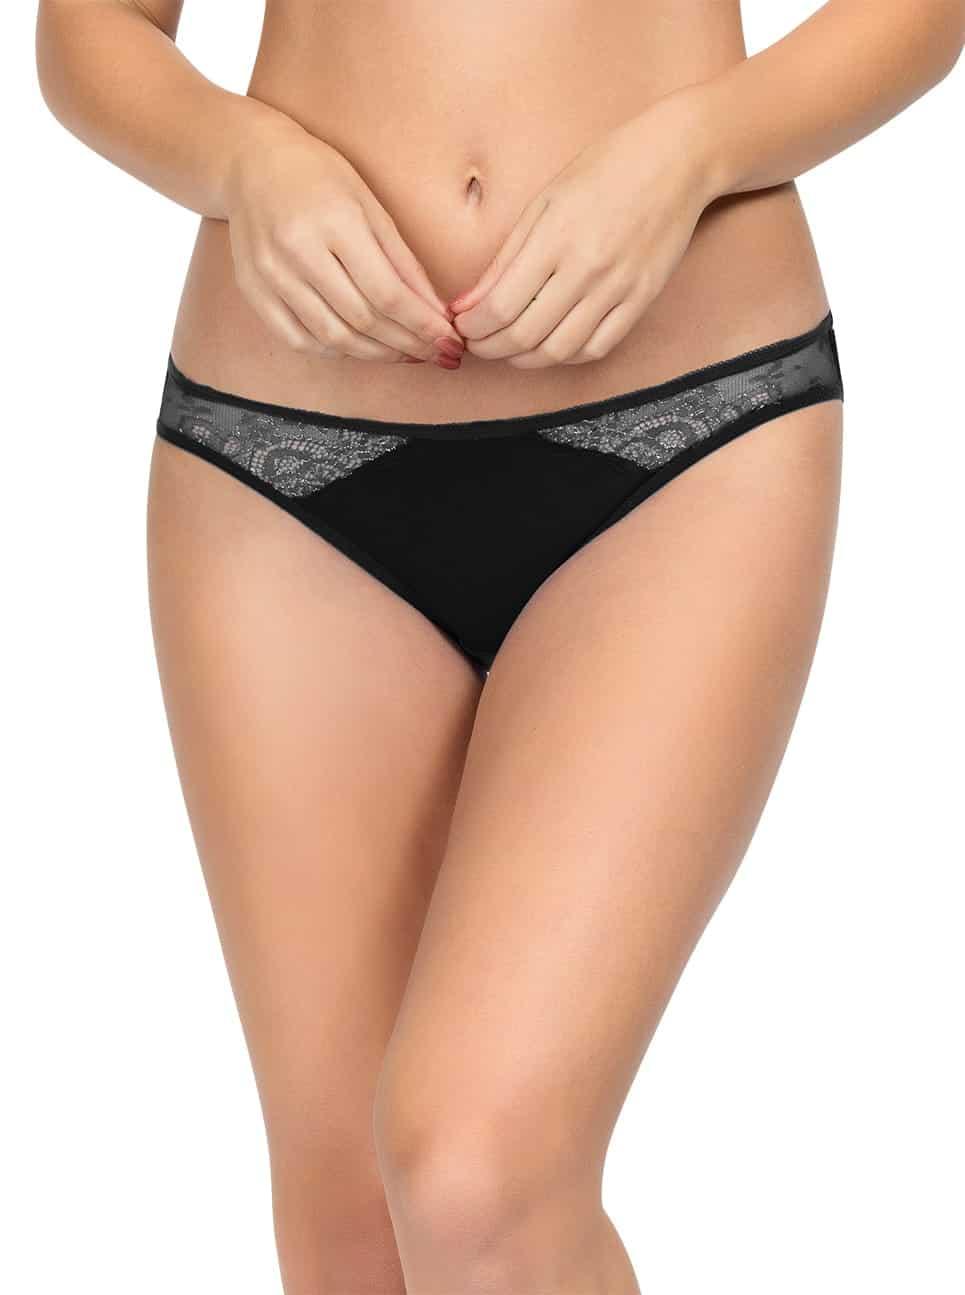 Allure Bikini – Black – A1493 1